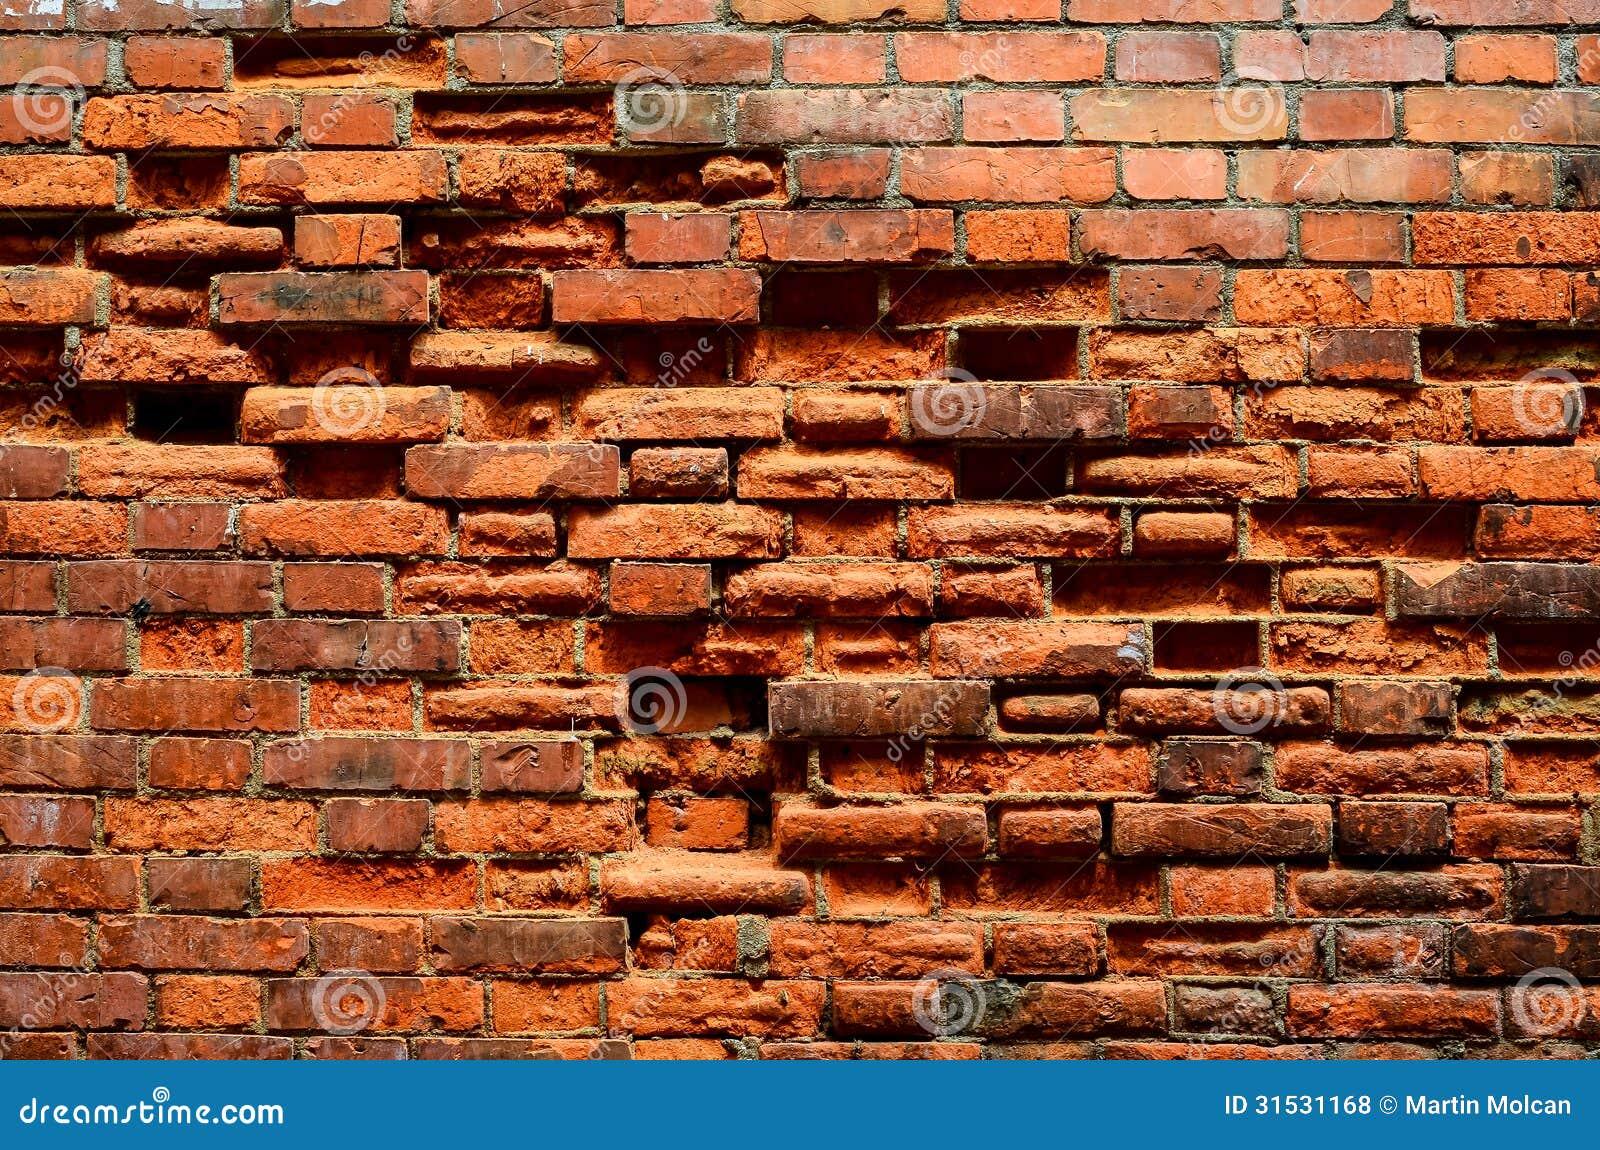 Vintage Brick Wall Texture Royalty Free Stock Photos